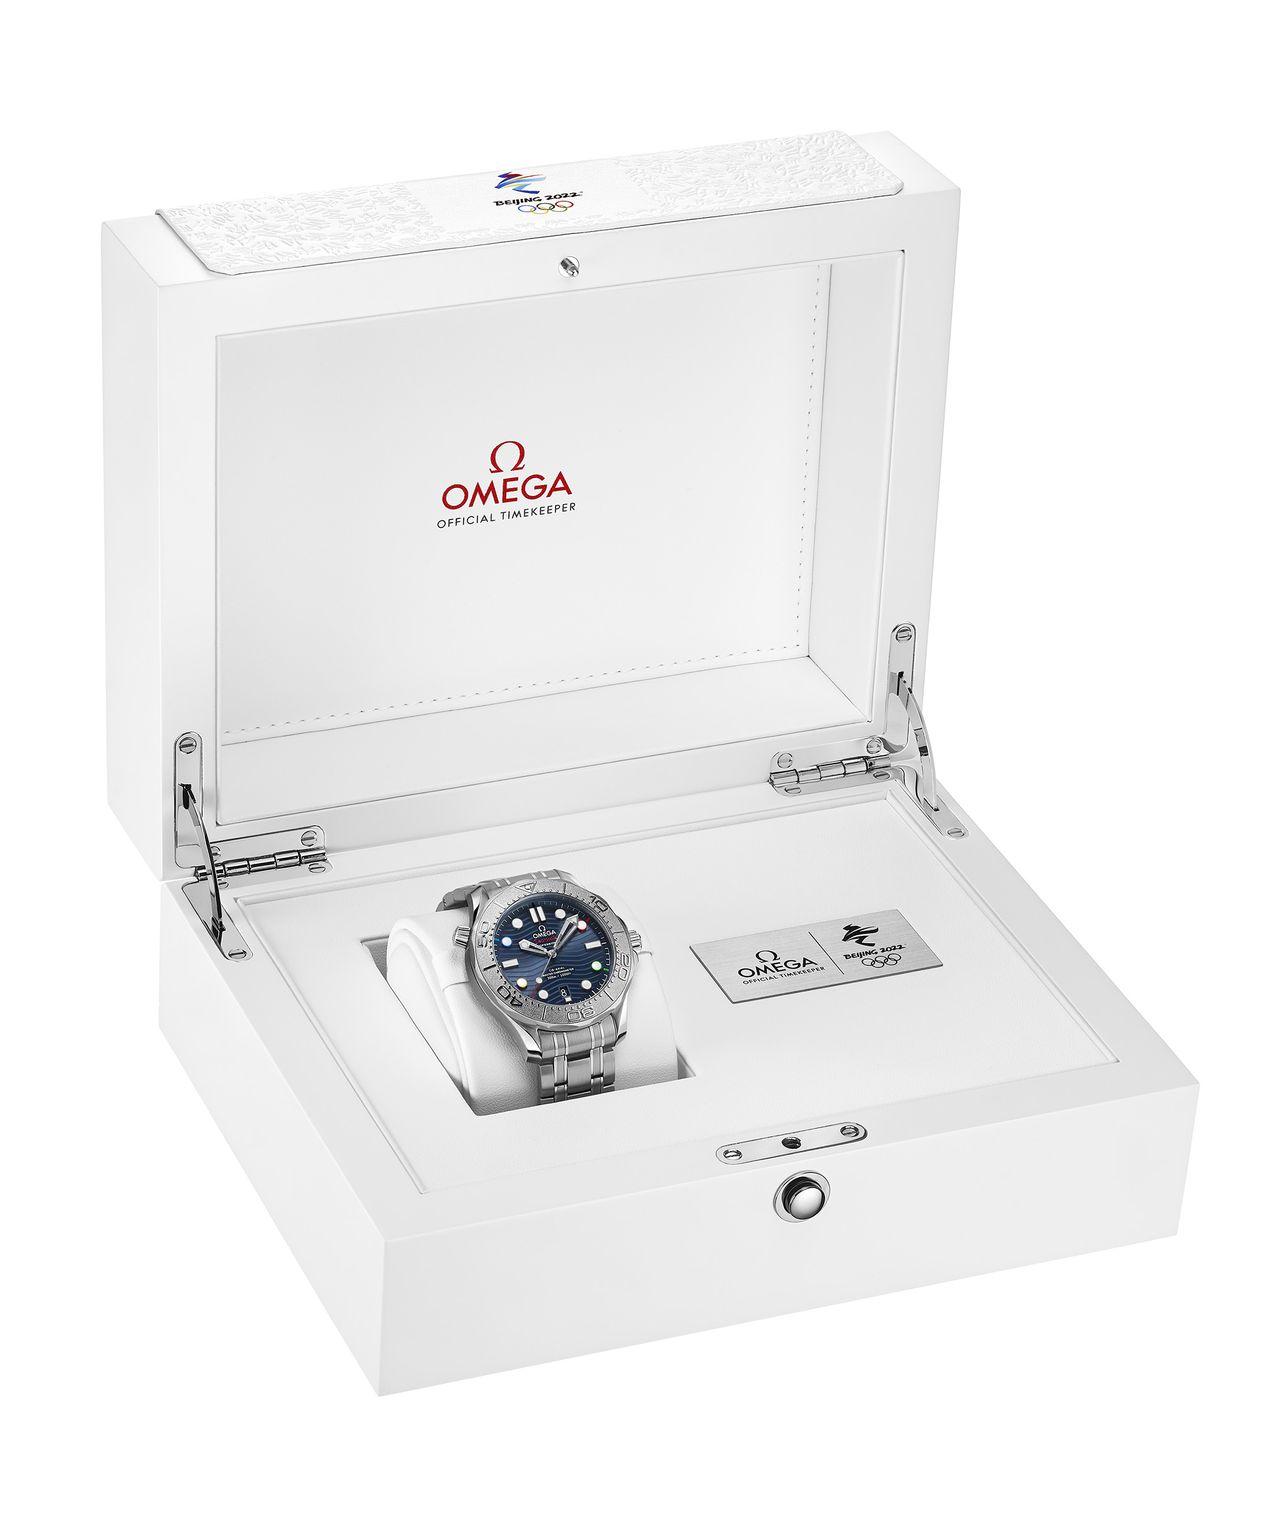 "Omega Seamaster Diver 300M ""Beijing 2022"" Special Edition - téli játékokhoz fehér doboz dukál"